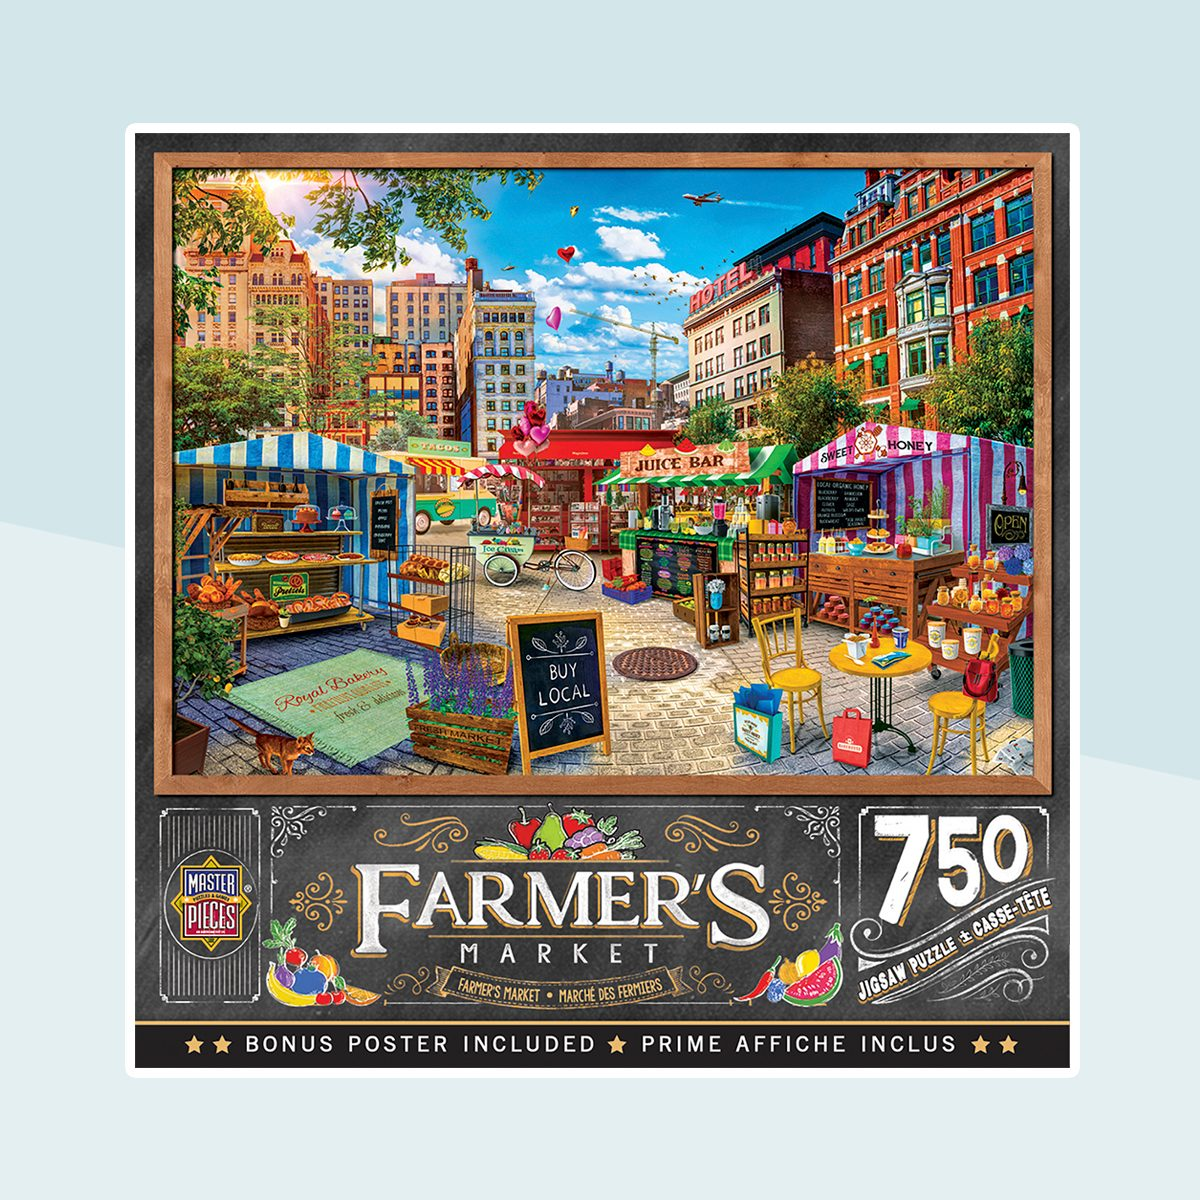 MasterPieces - Farmer's Market - Buy Local Honey - 750 Piece Jigsaw Puzzle